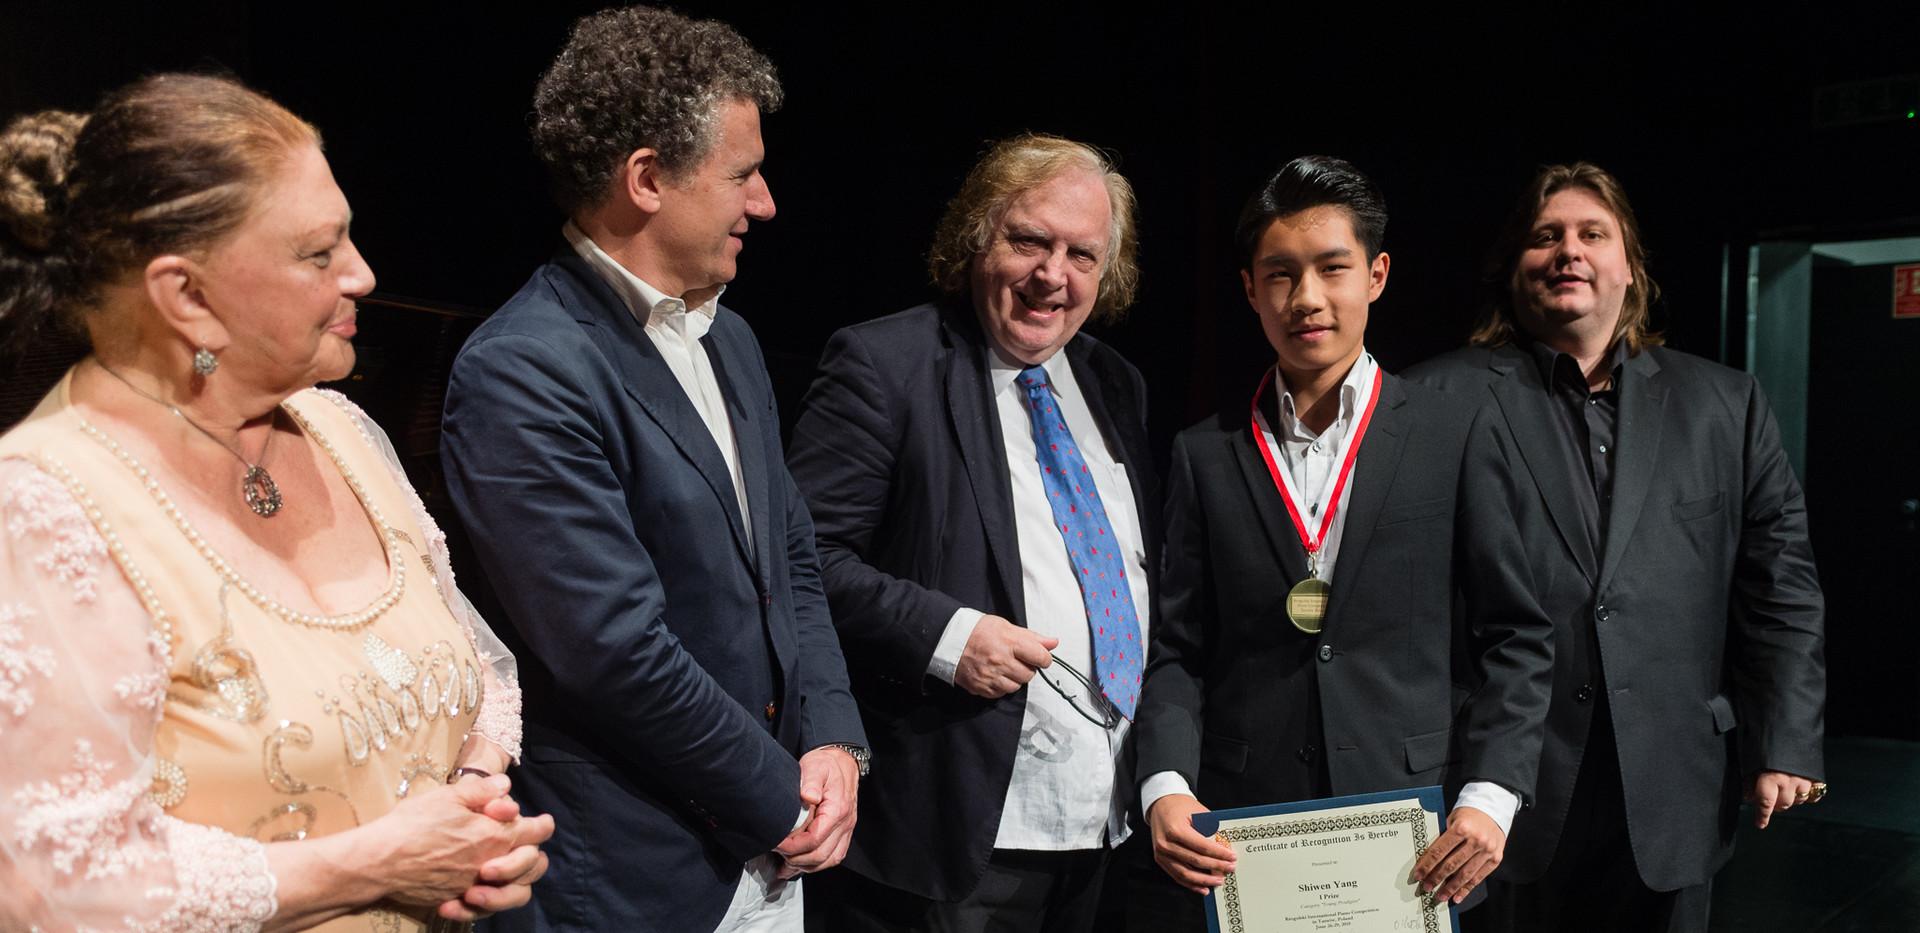 "Oxana Yablonskaya, Alexis Soriano, Einar Steen-Nøkleberg -  Shiwen Yang, Chiny - I Nagroda, Kategoria ""Młodzi Wirtuozi"""